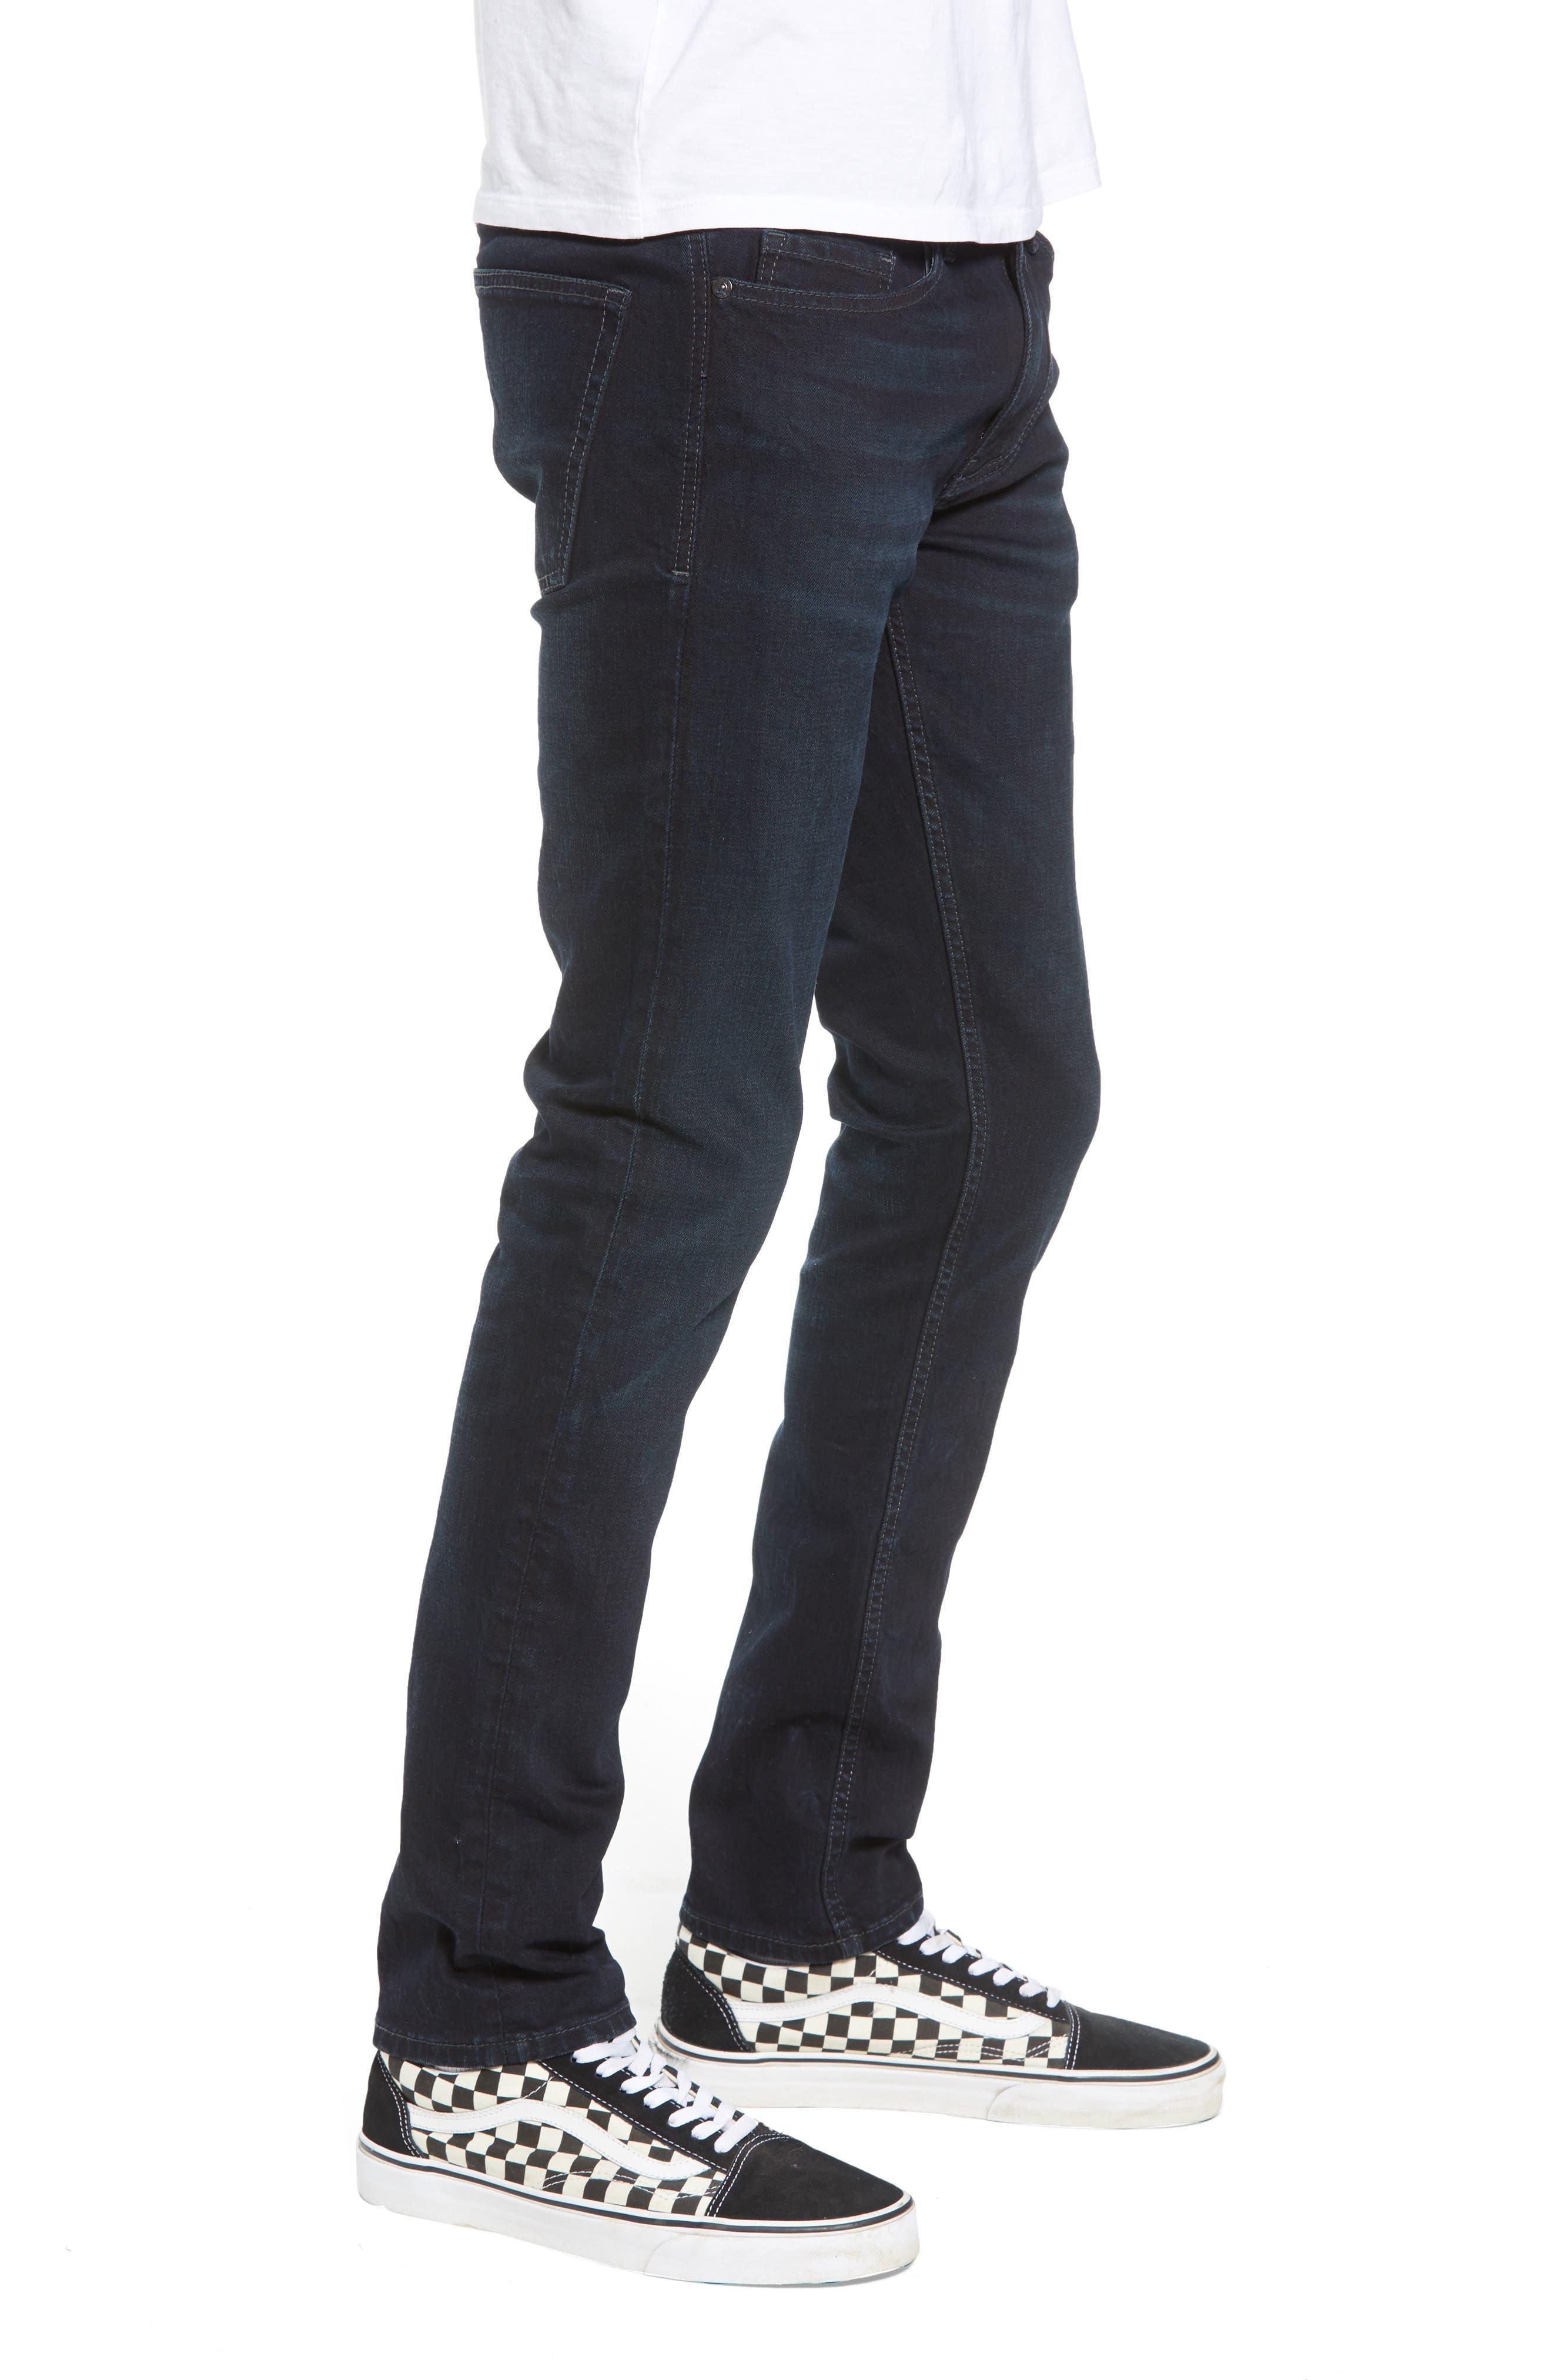 Wooster Slim Fit Jeans,                             Alternate thumbnail 3, color,                             409